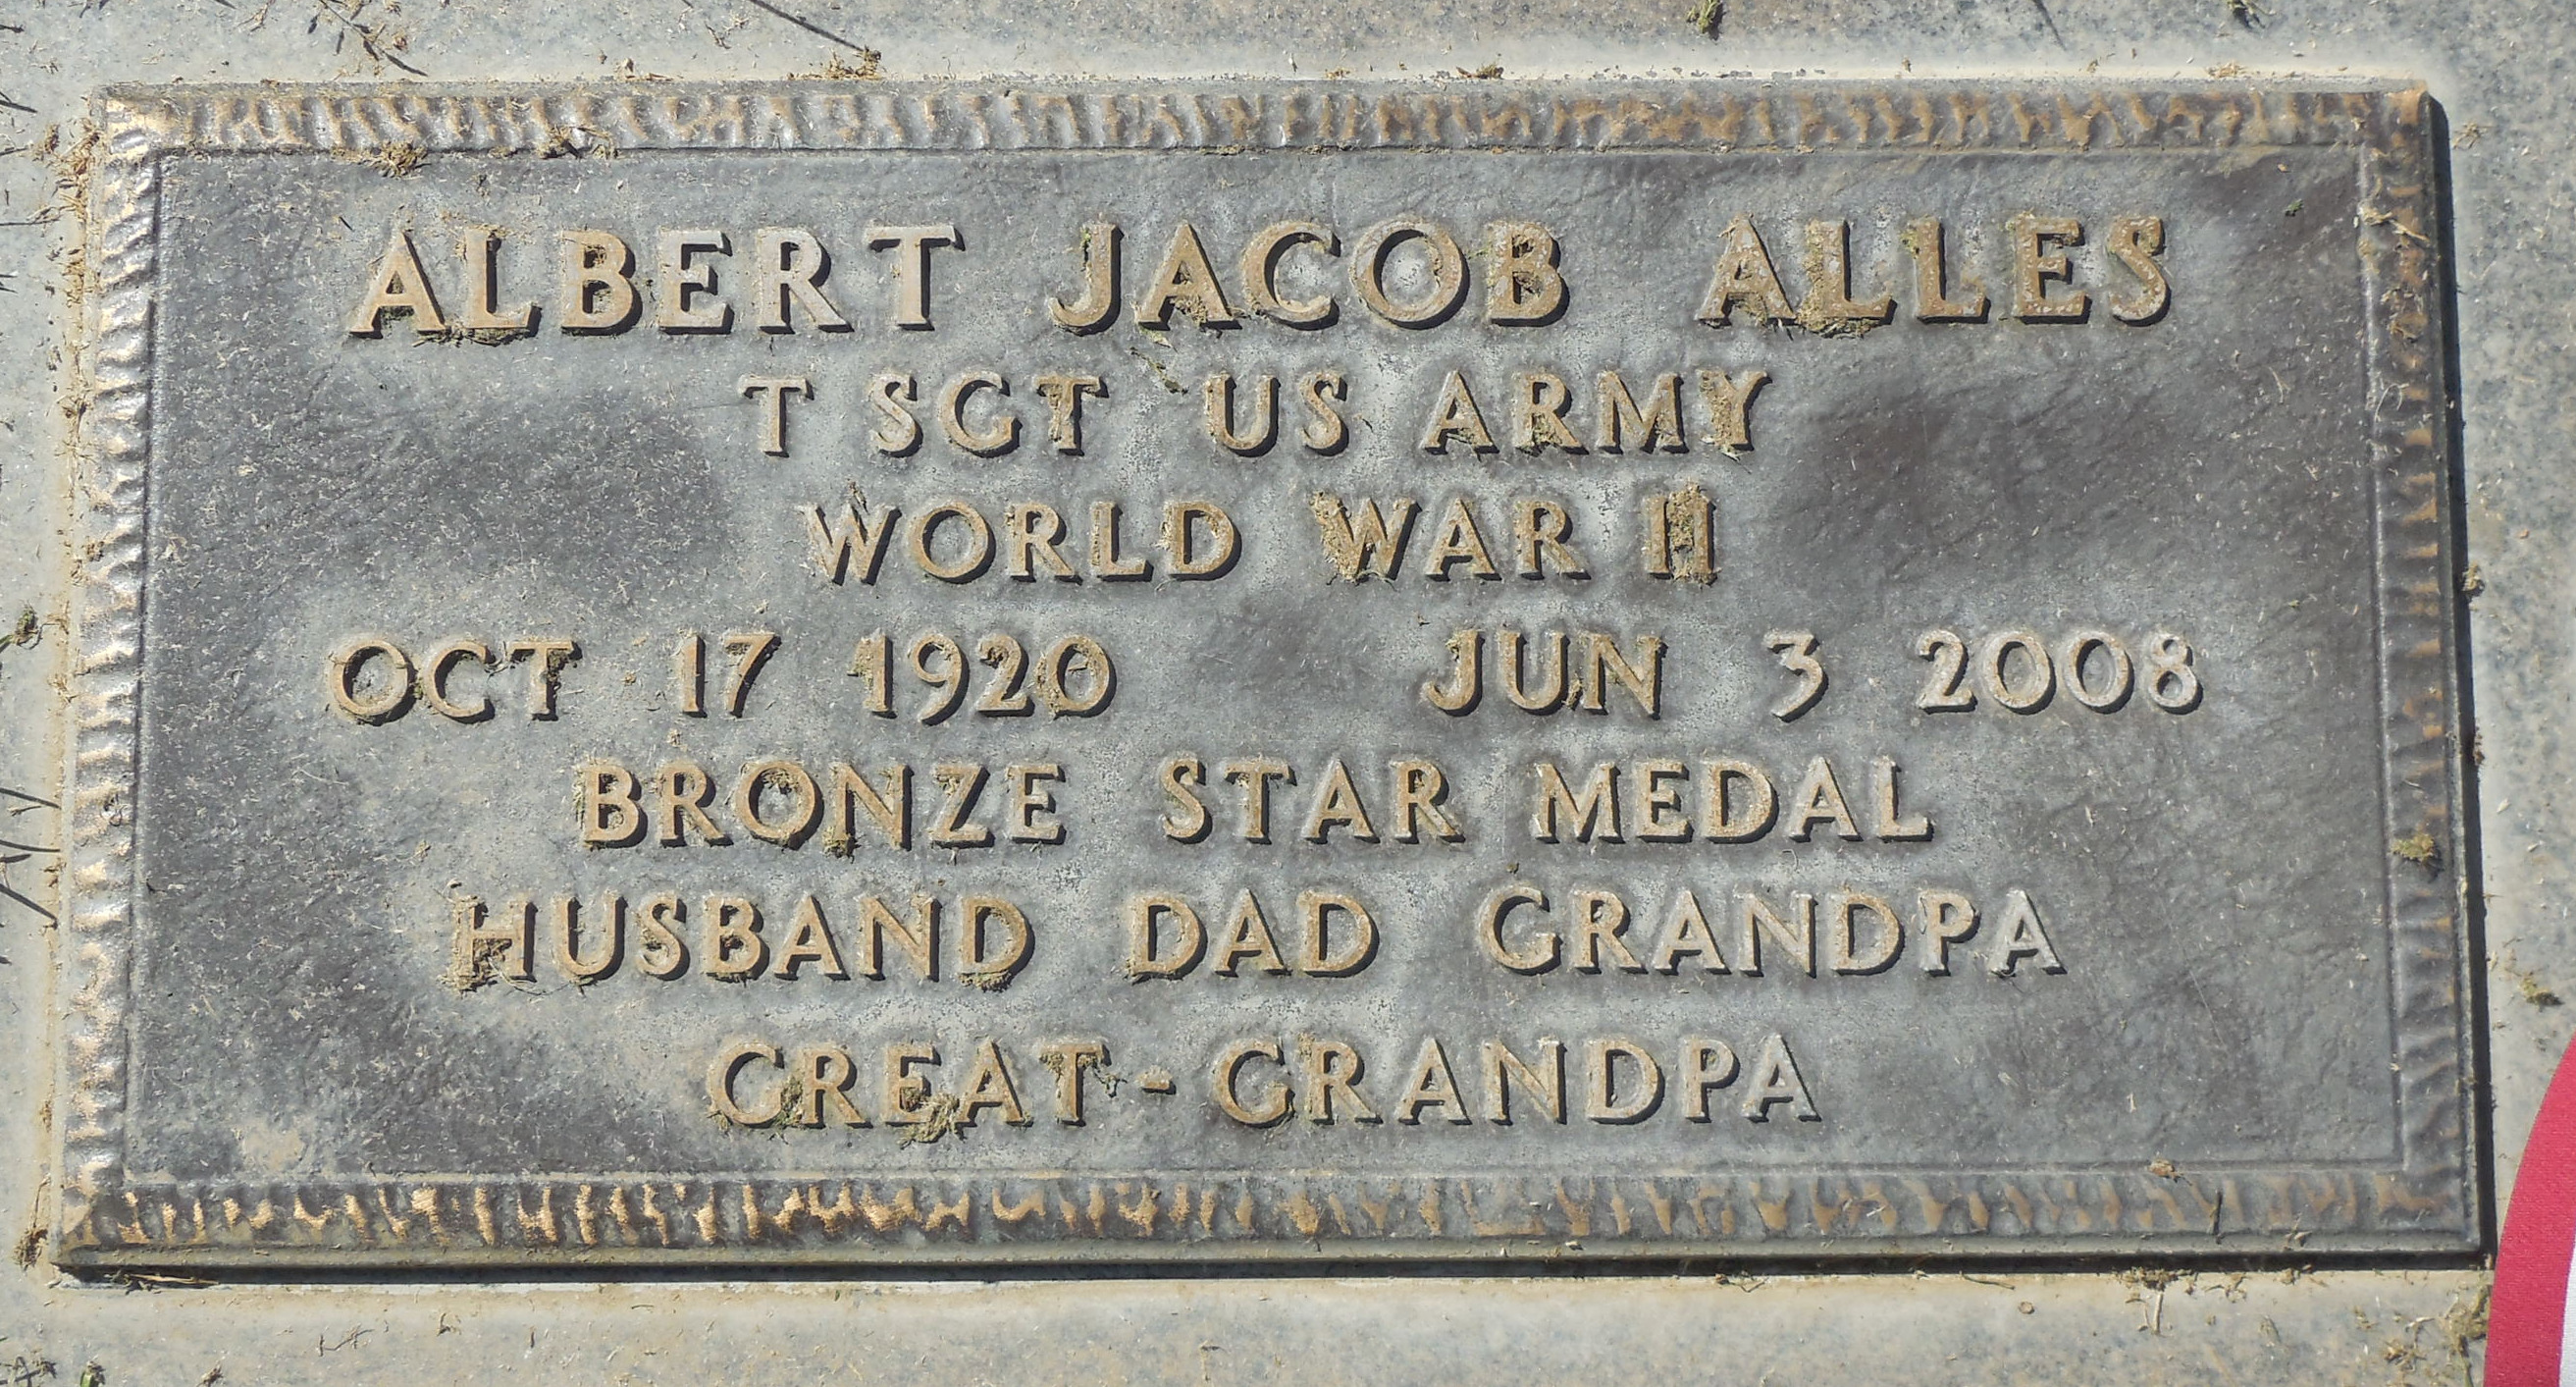 Albert Jacob Alles